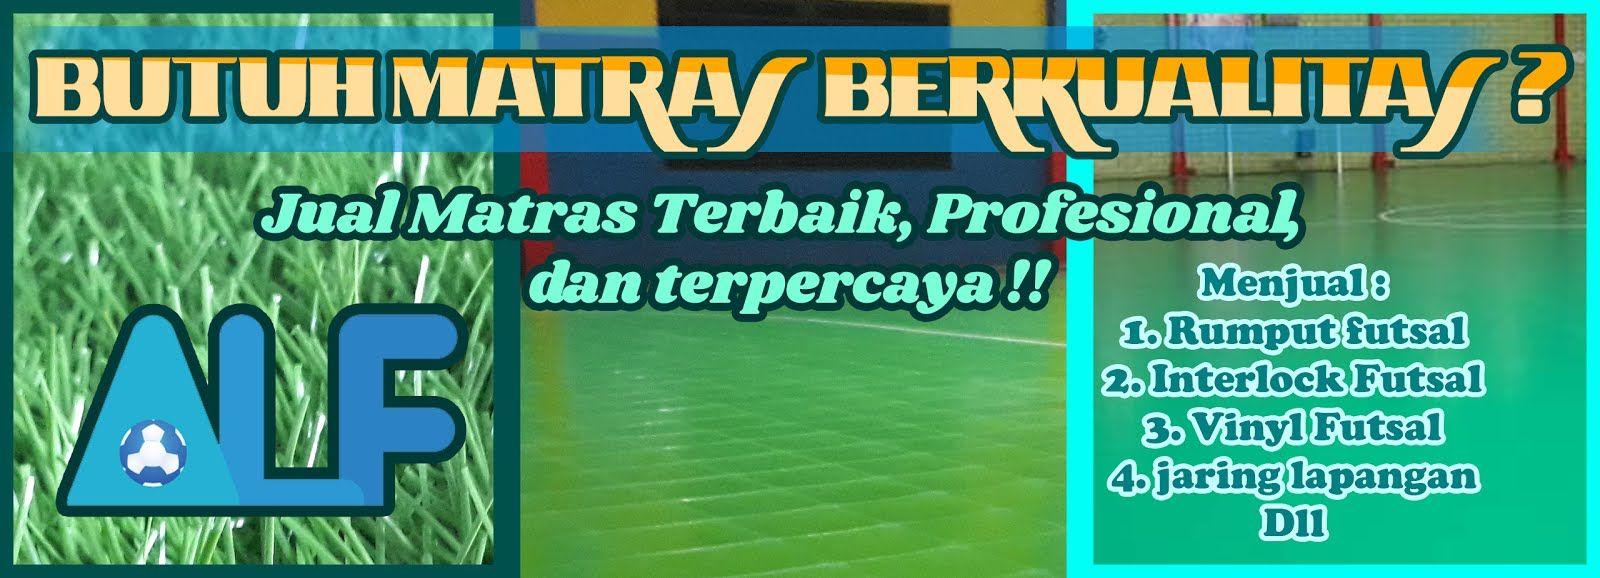 Amanah Lantai Futsal